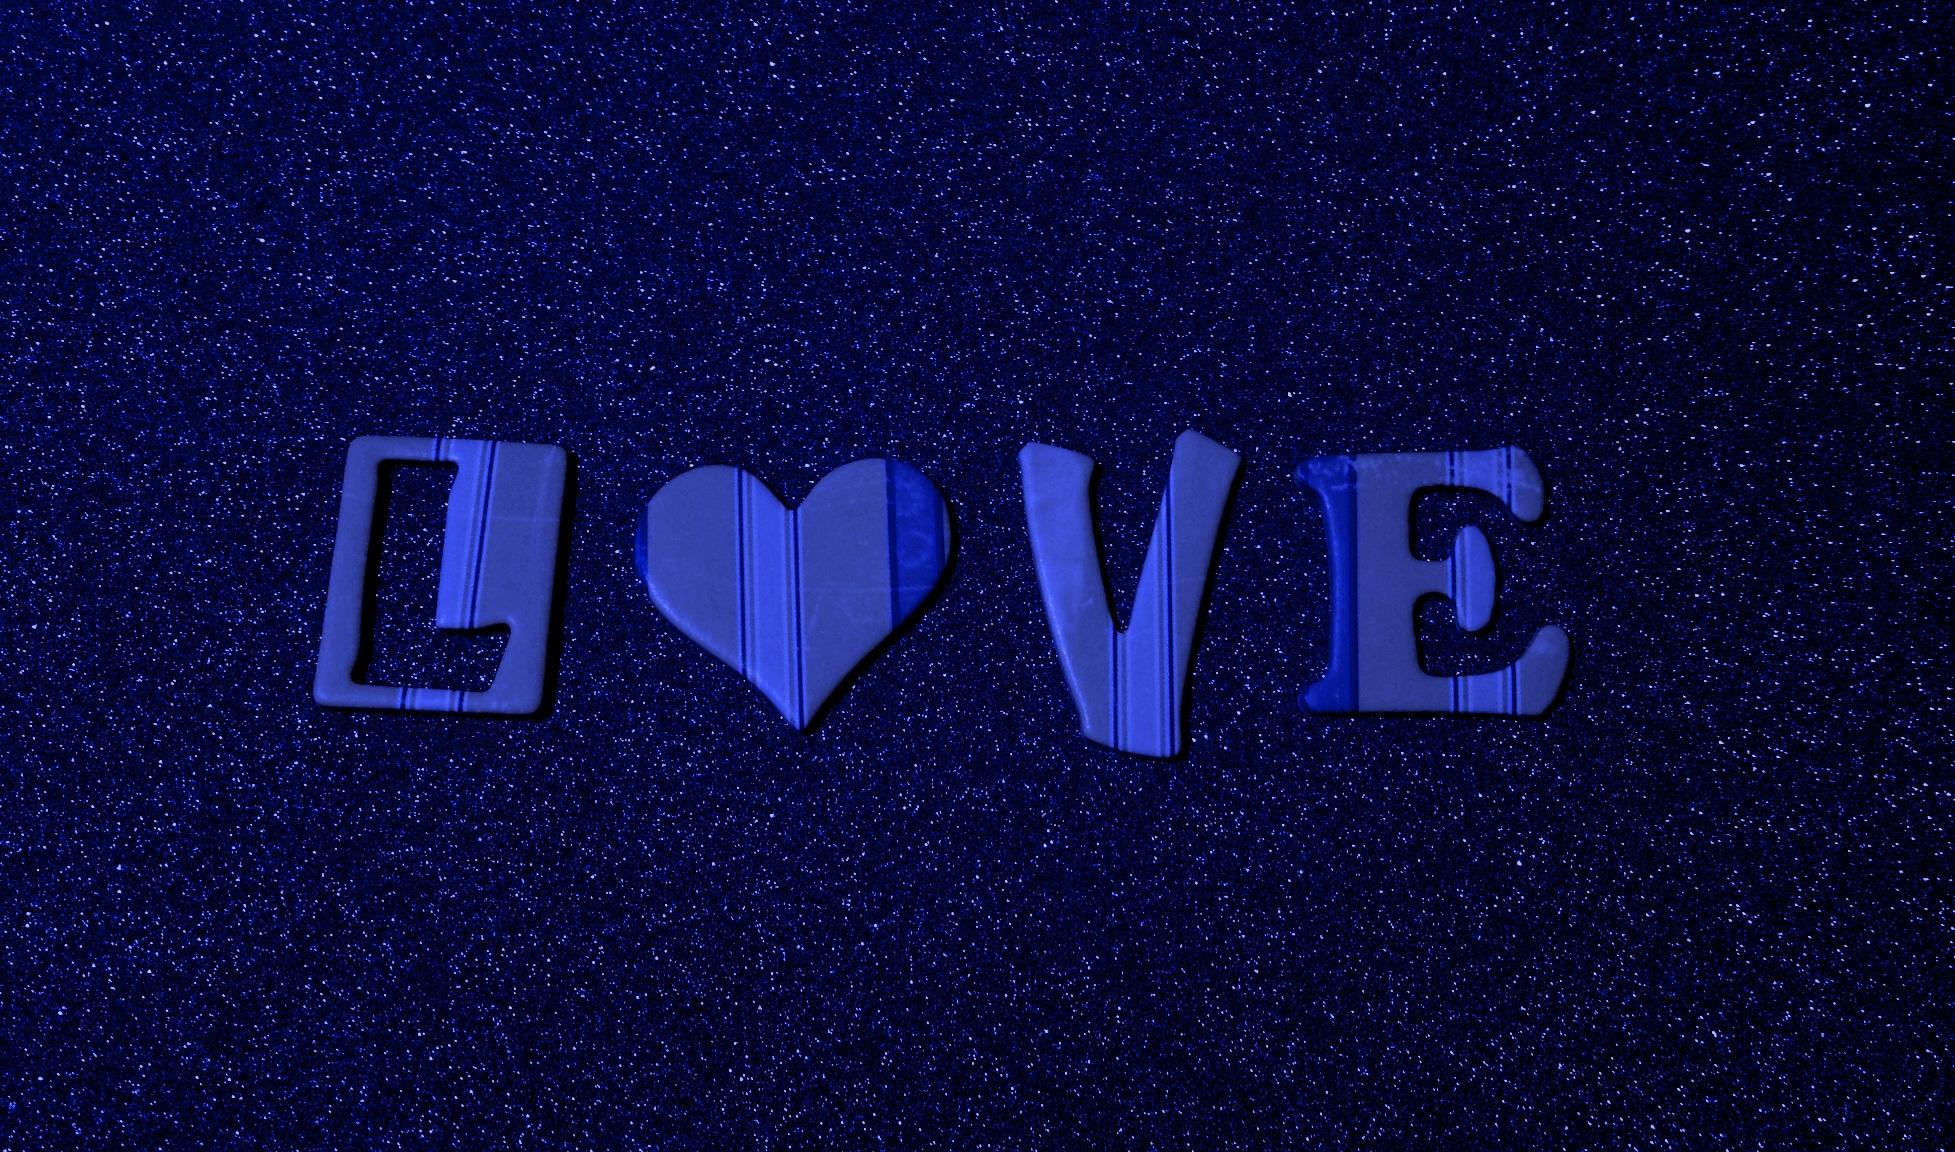 Gambar Tekstur Jumlah Cinta Jantung Percintaan